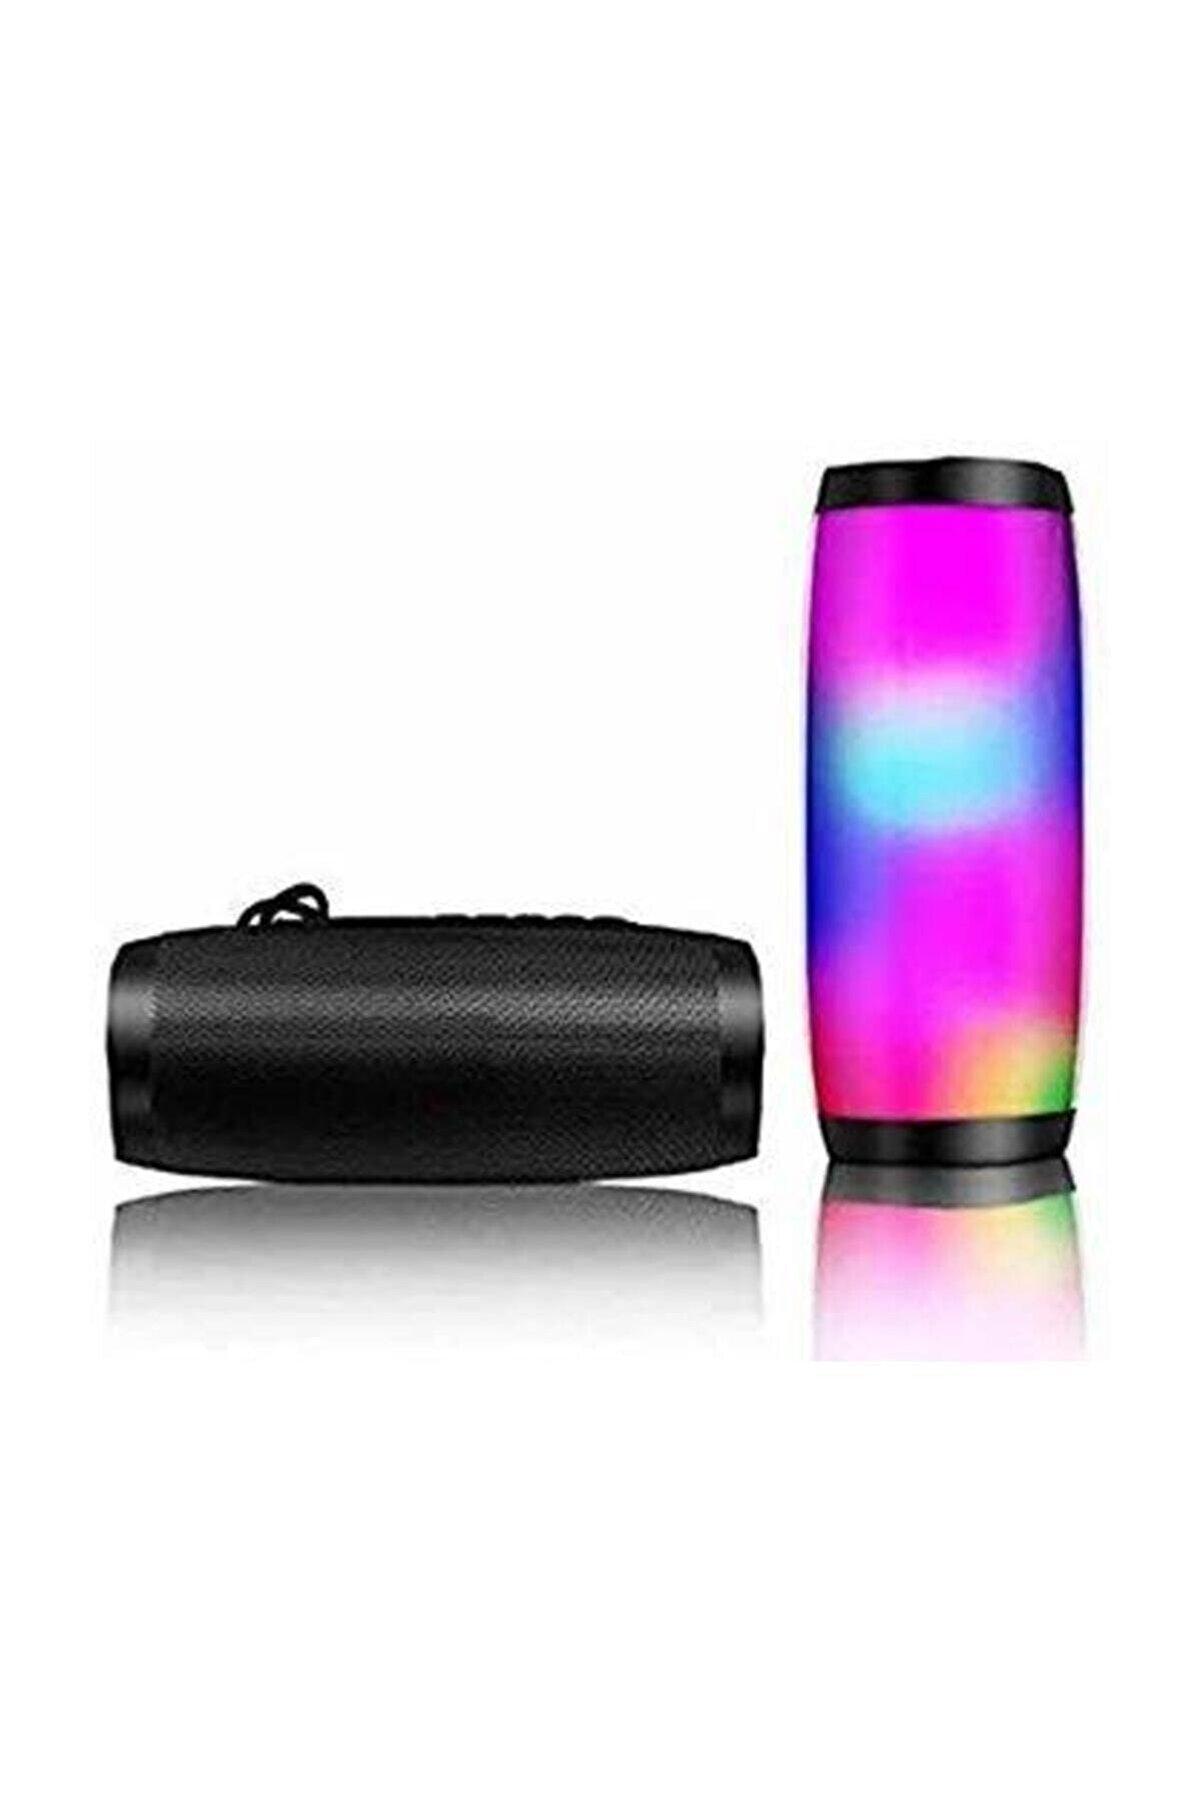 Polygold Teknomarketim Kablosuz Hoparlör Bluetooth Speaker Işıklı Ses Bombası Tg 157 Siyah